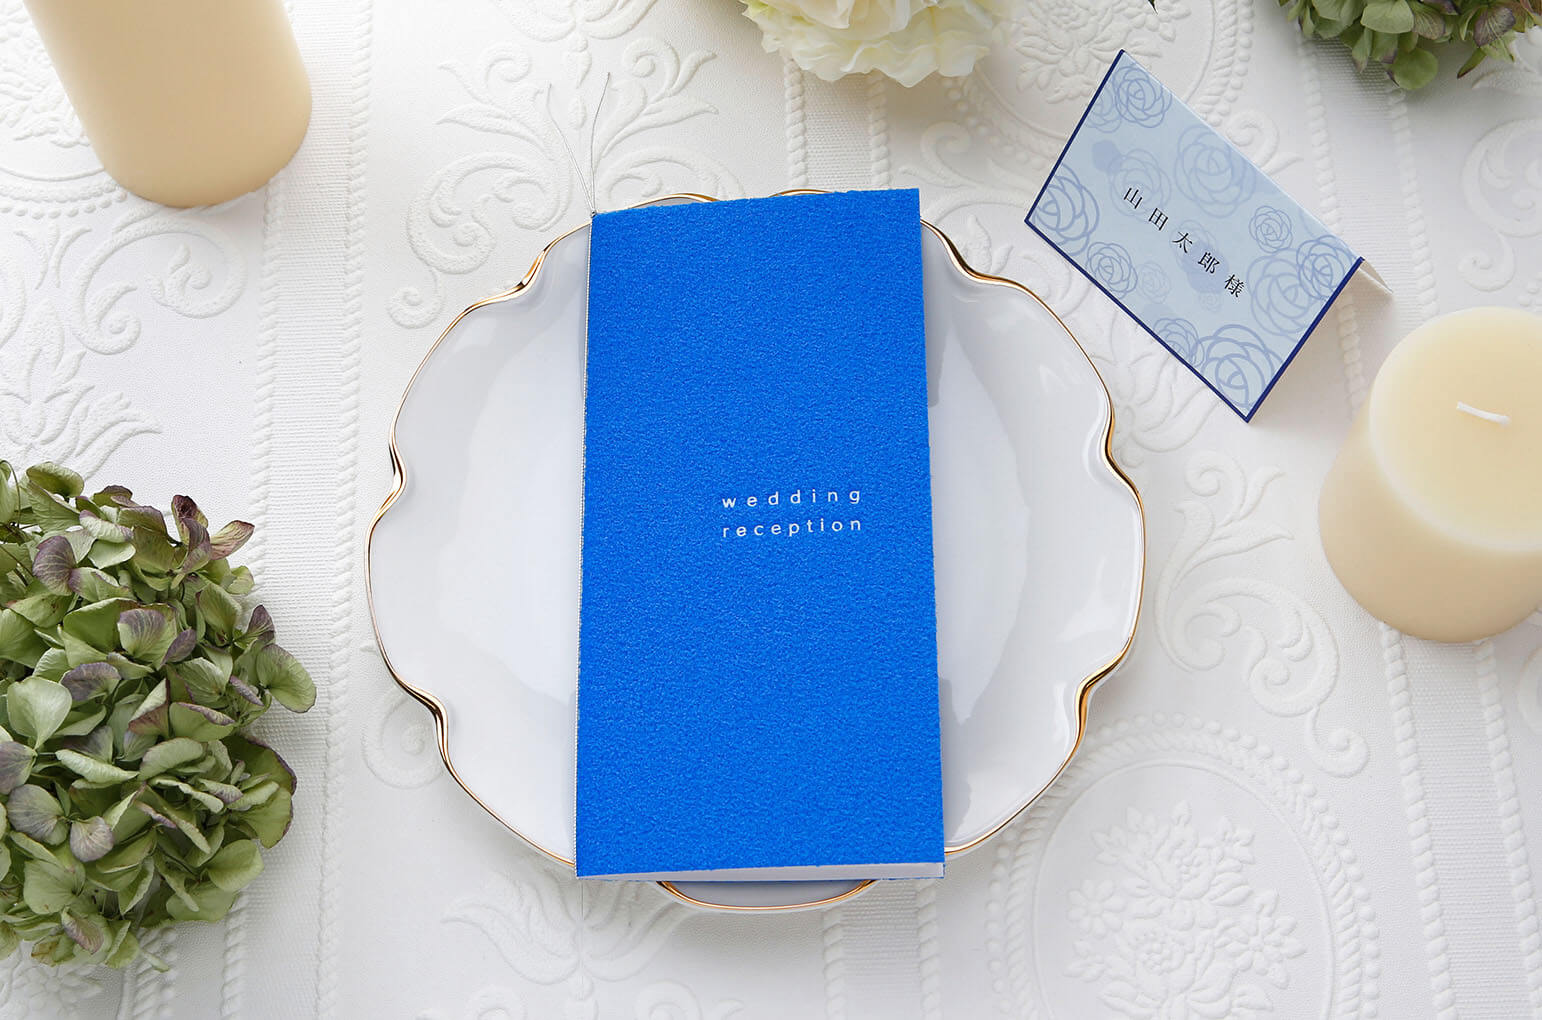 b90037f768fa8 期間限定☆フラワーフレーム席次表50円キャンペーン♪- 結婚式招待状のbless